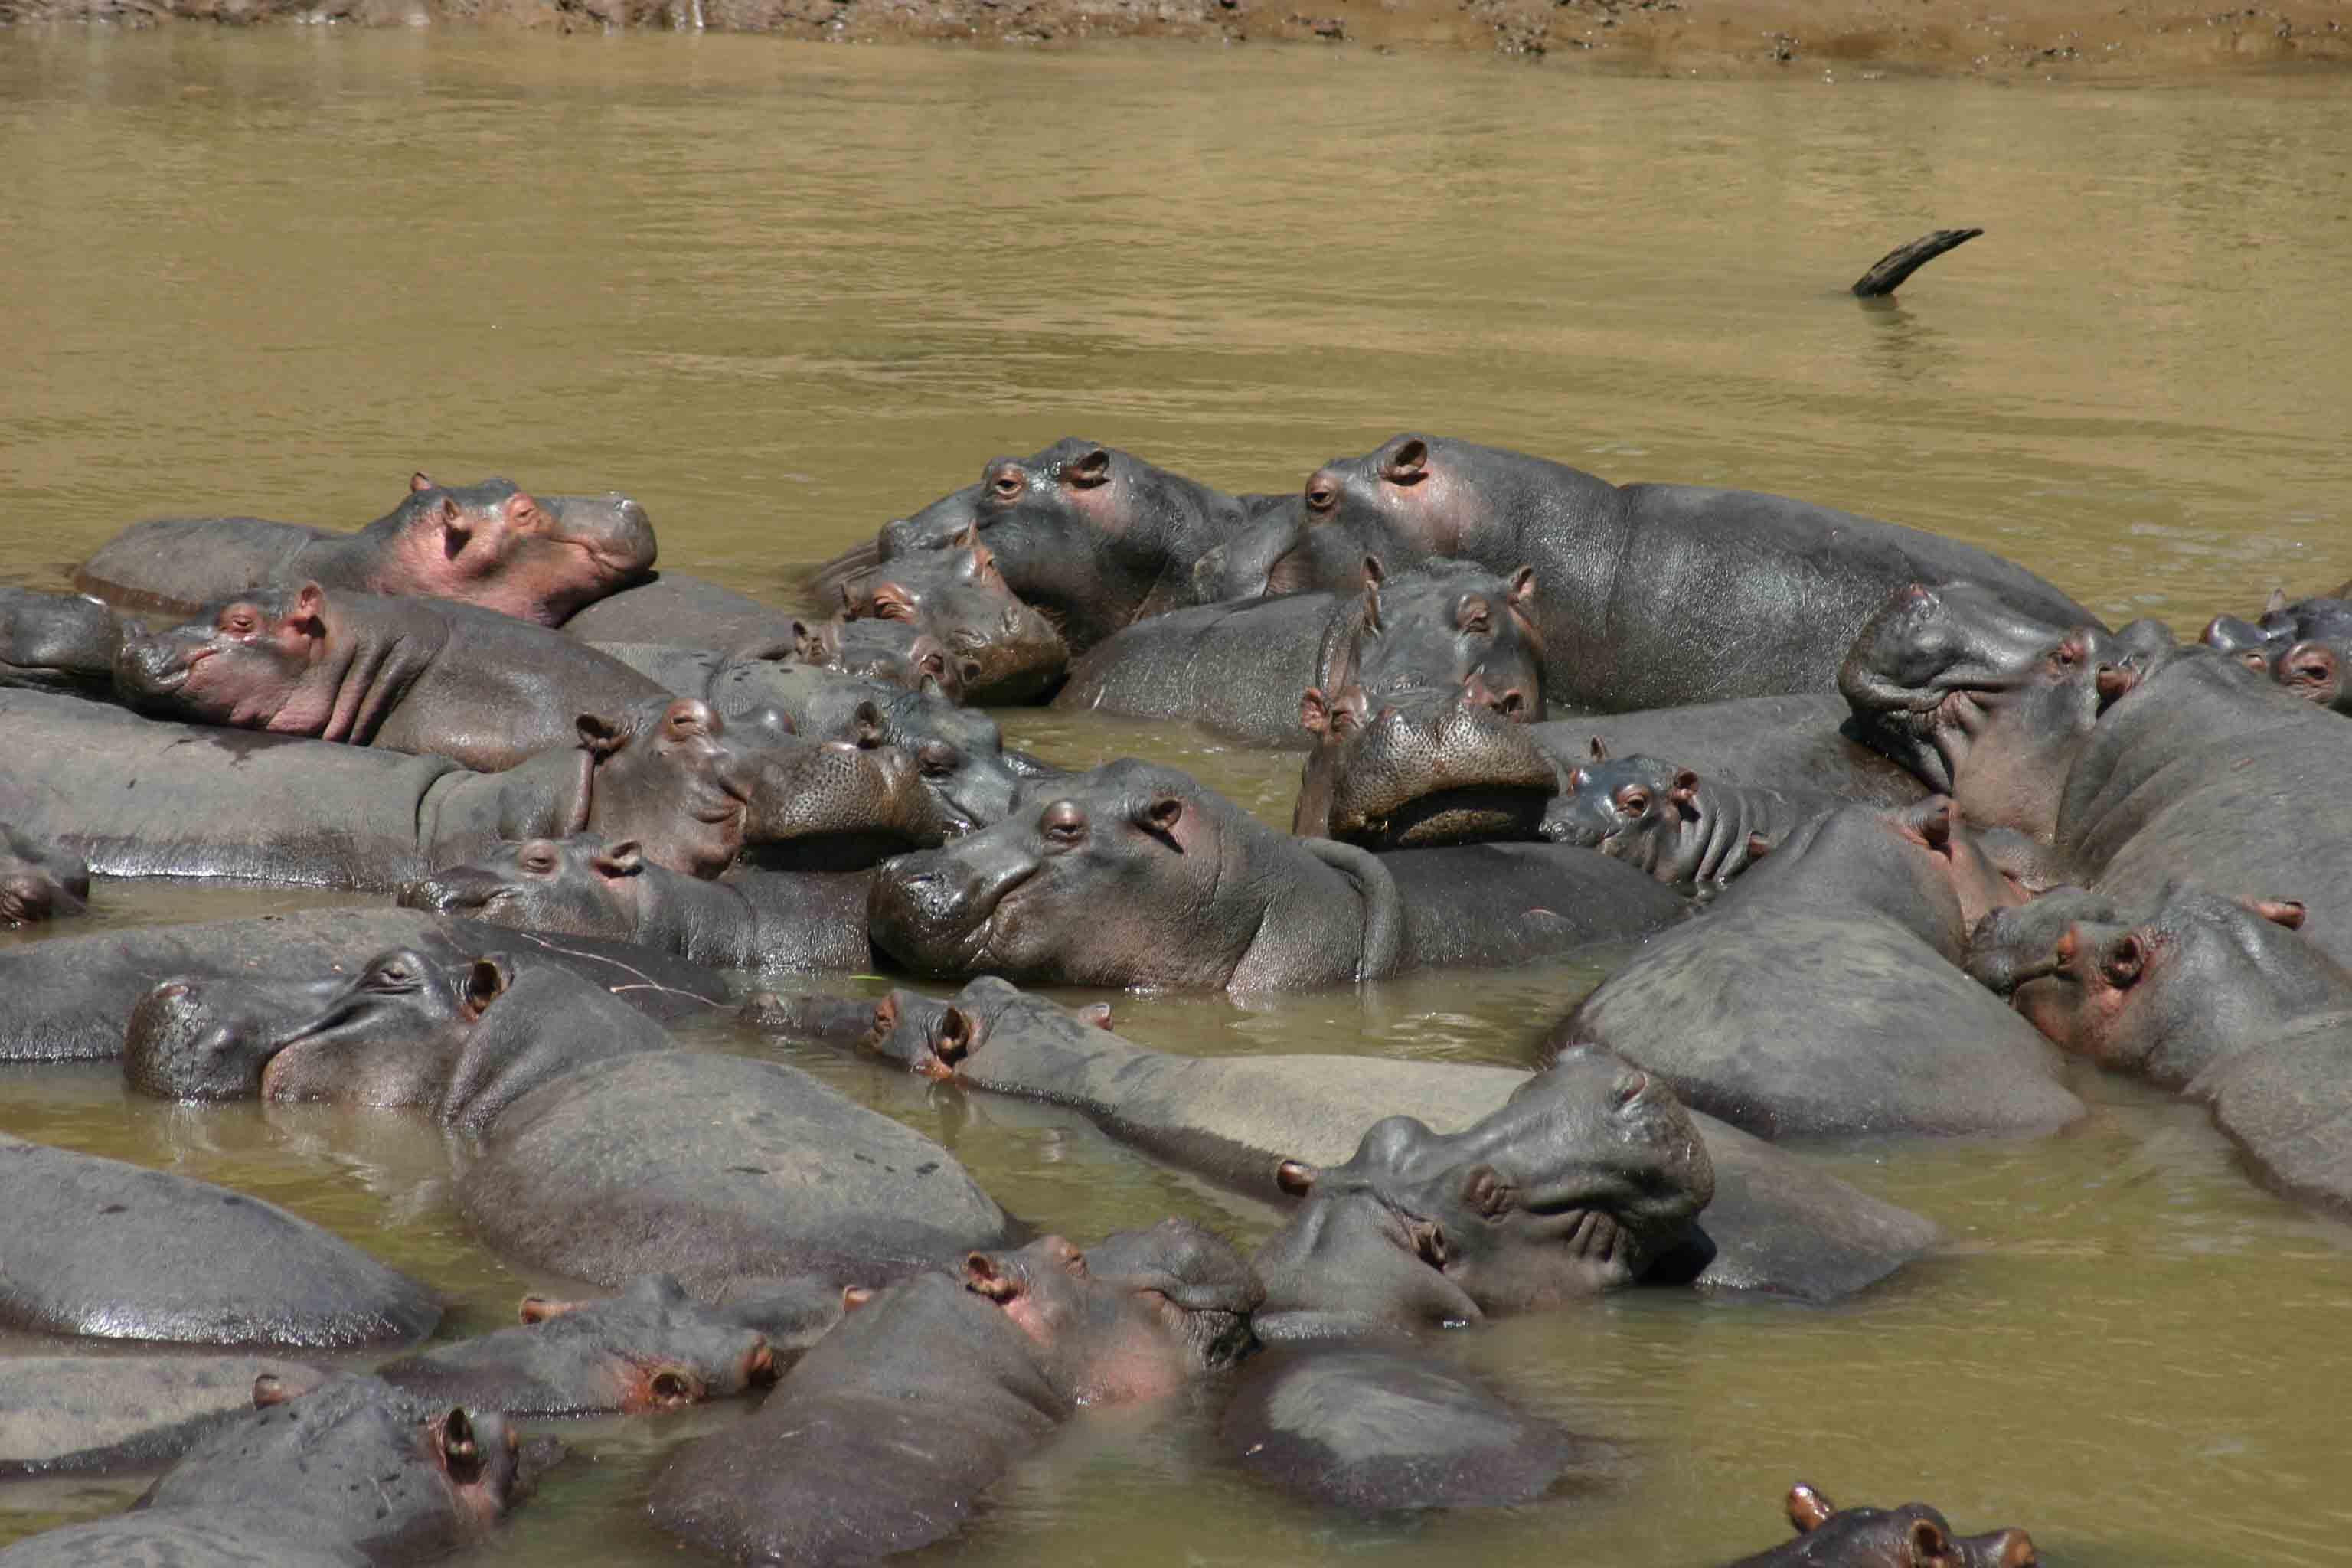 Hippos in the Mara